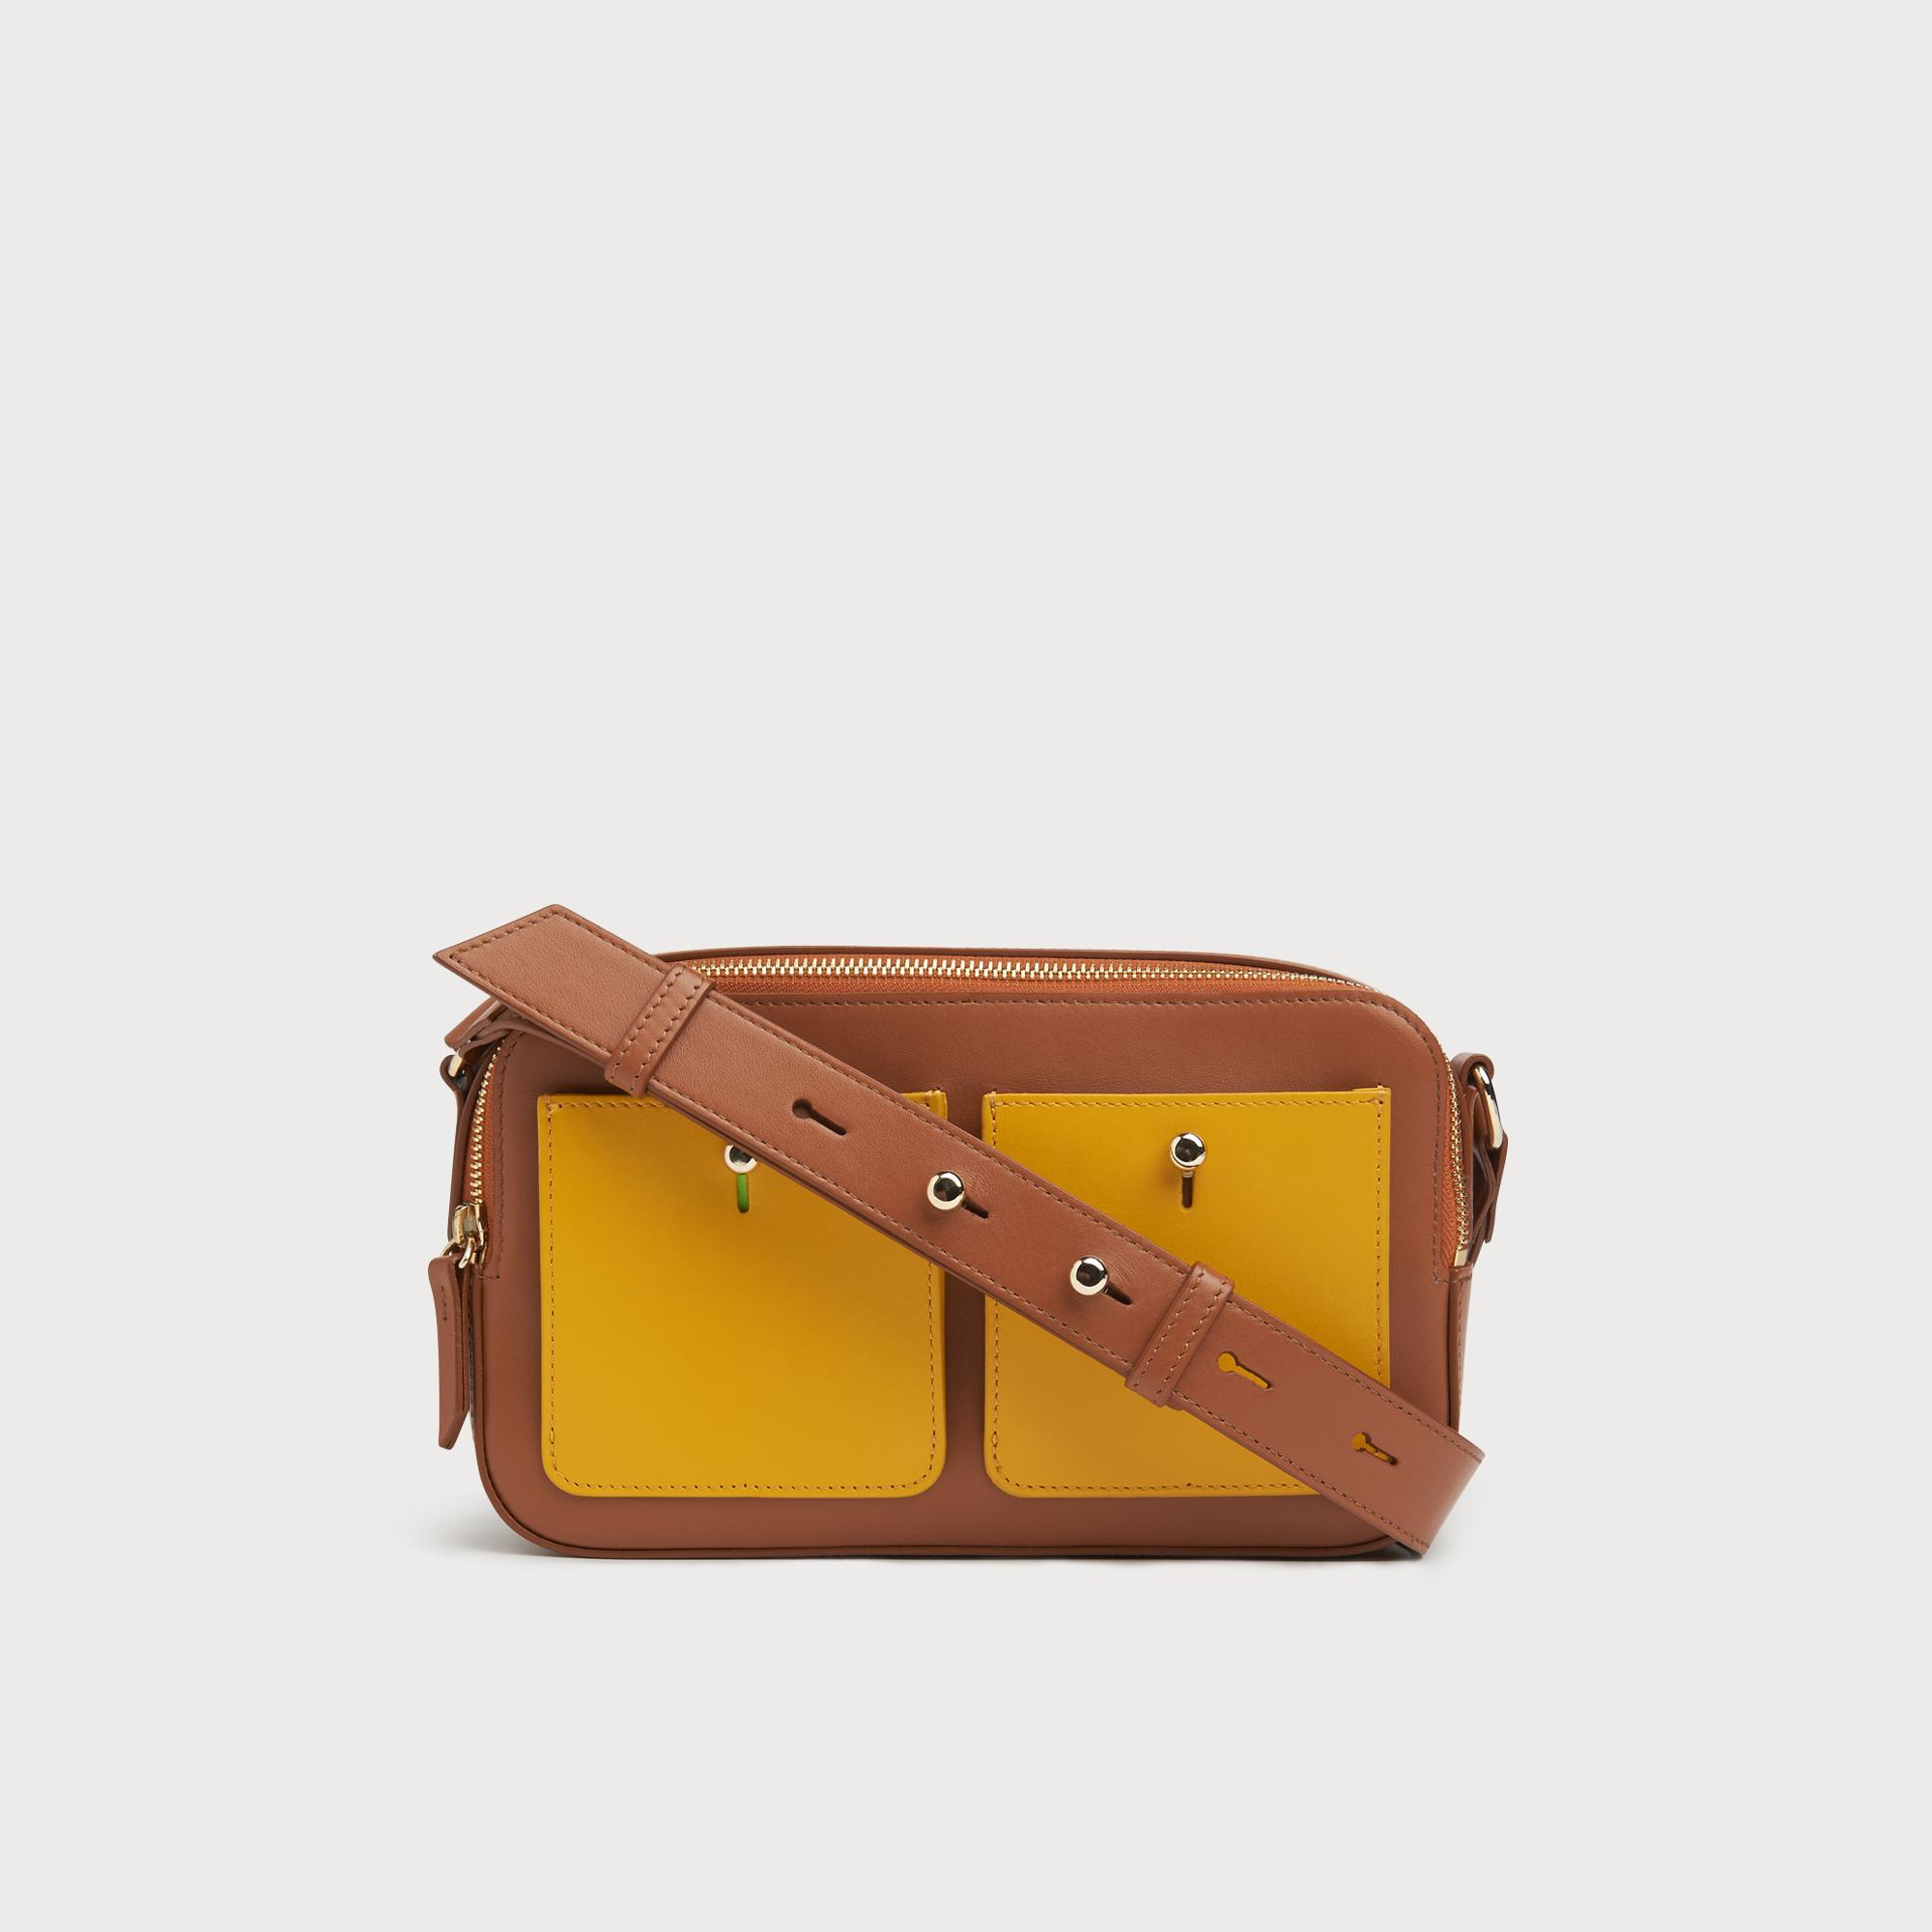 659569adf64 Matilda Tan Leather Shoulder Bag | Handbags | L.K.Bennett